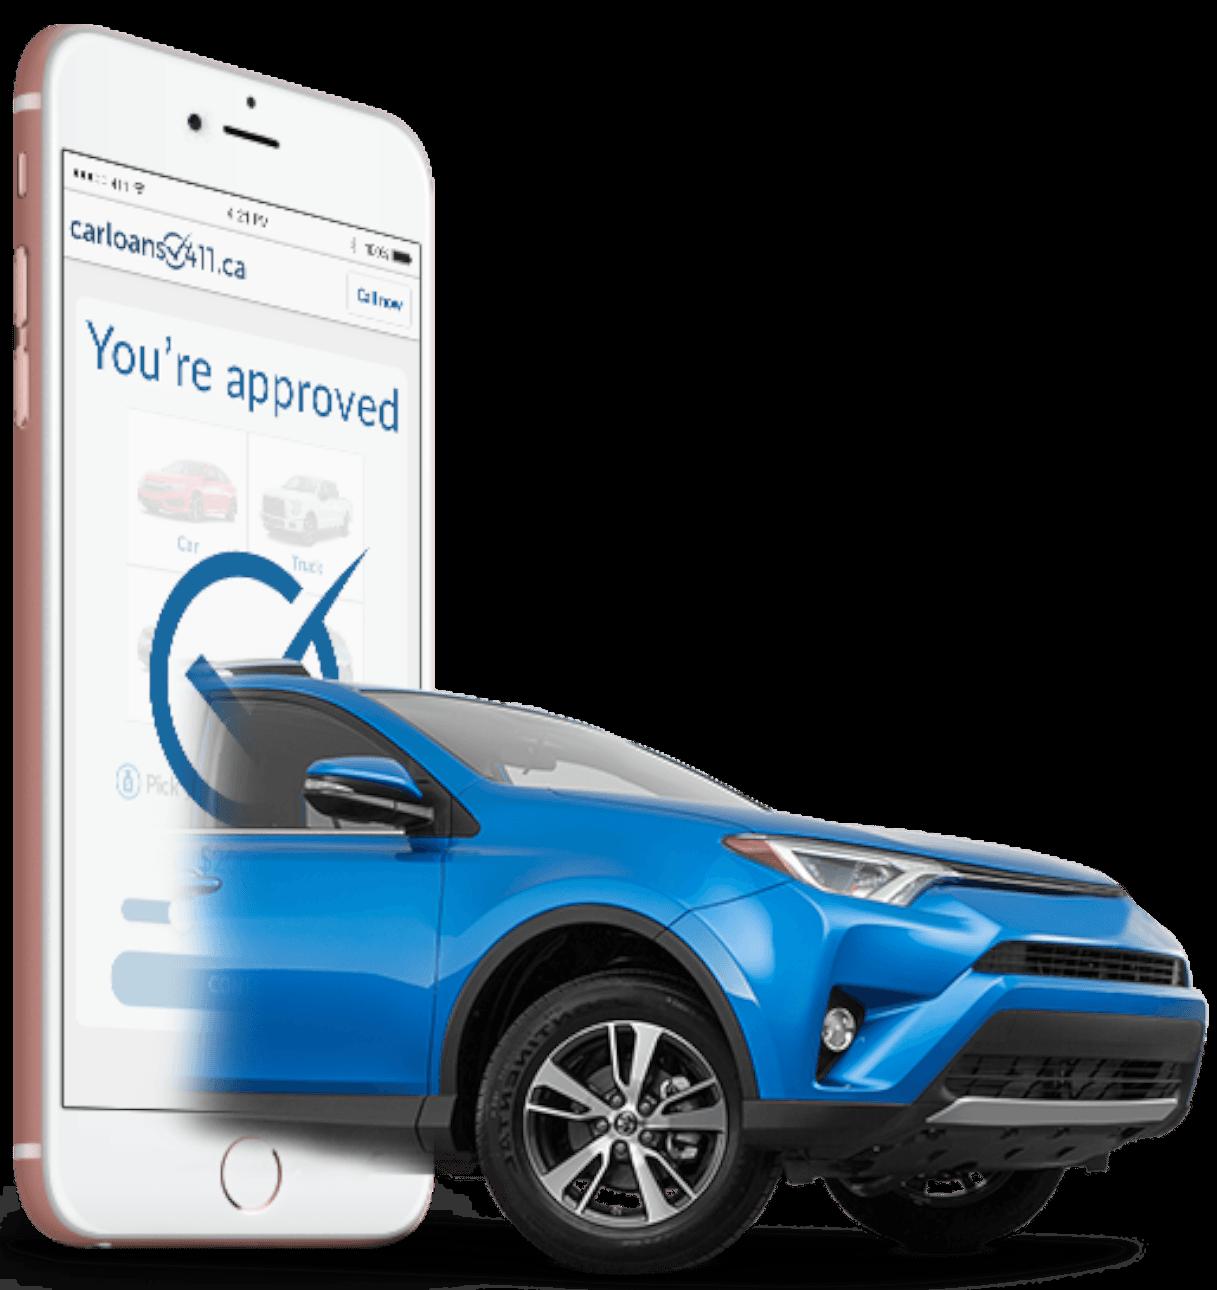 Car And Phone